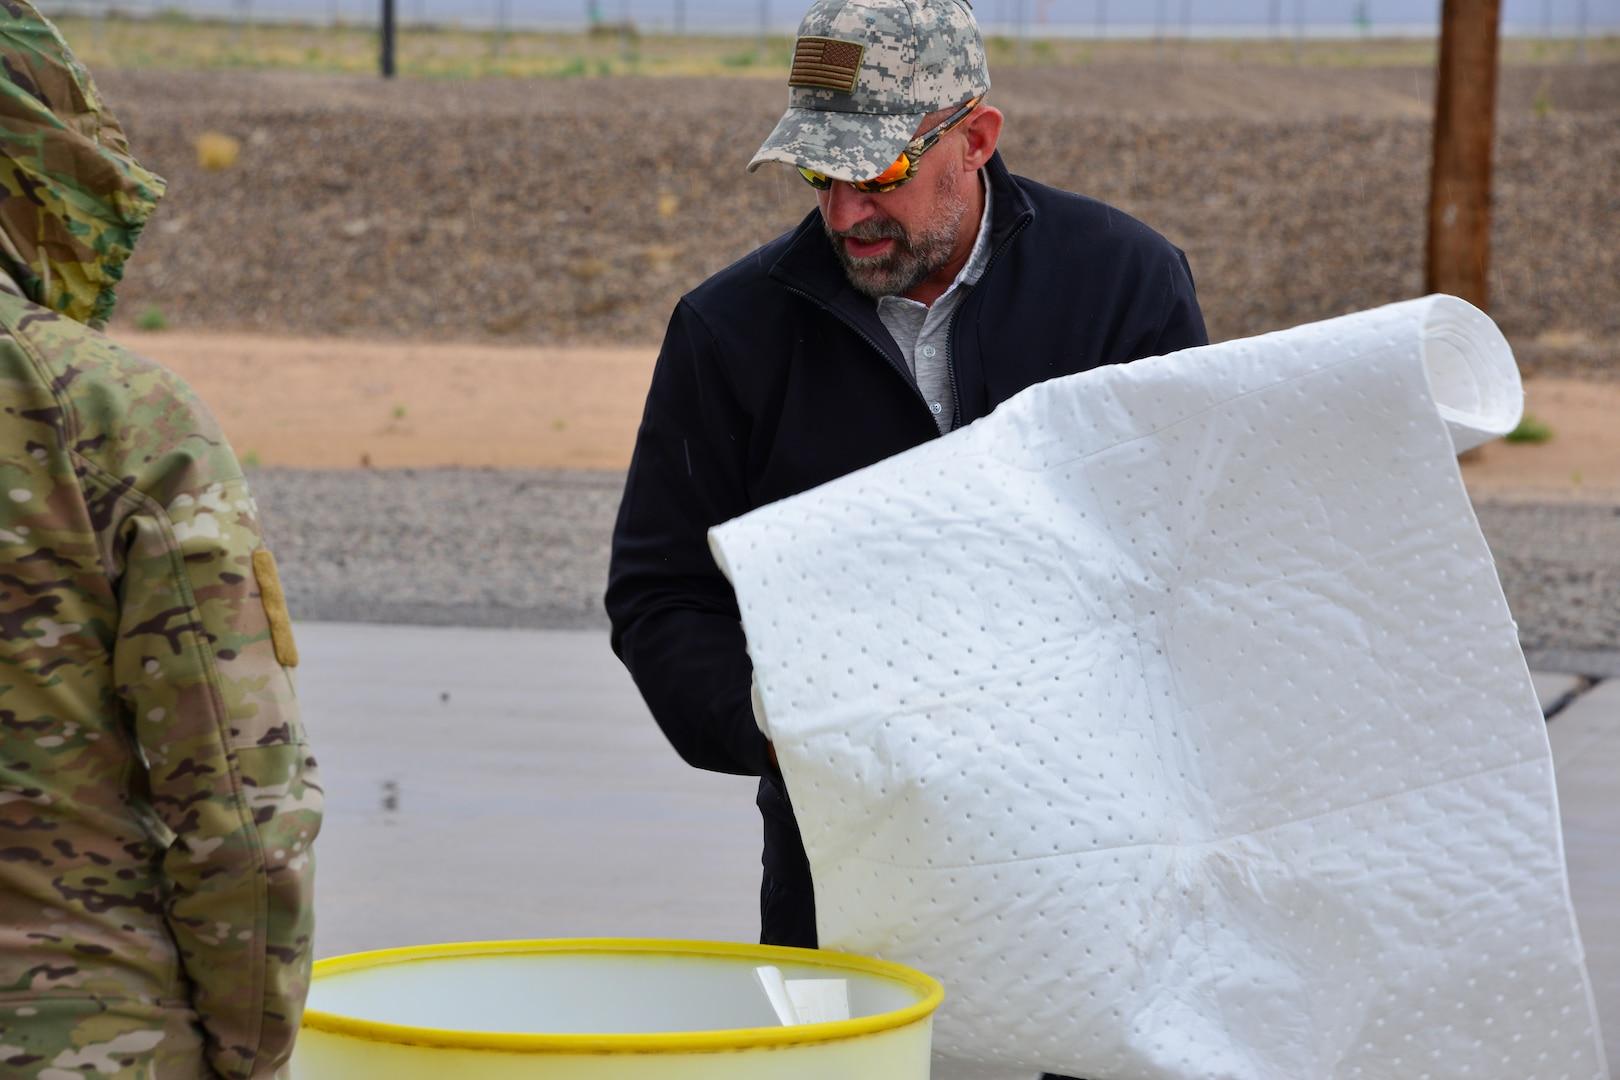 Man holds spill kit absorbent blanket at Kirtland, AFB.